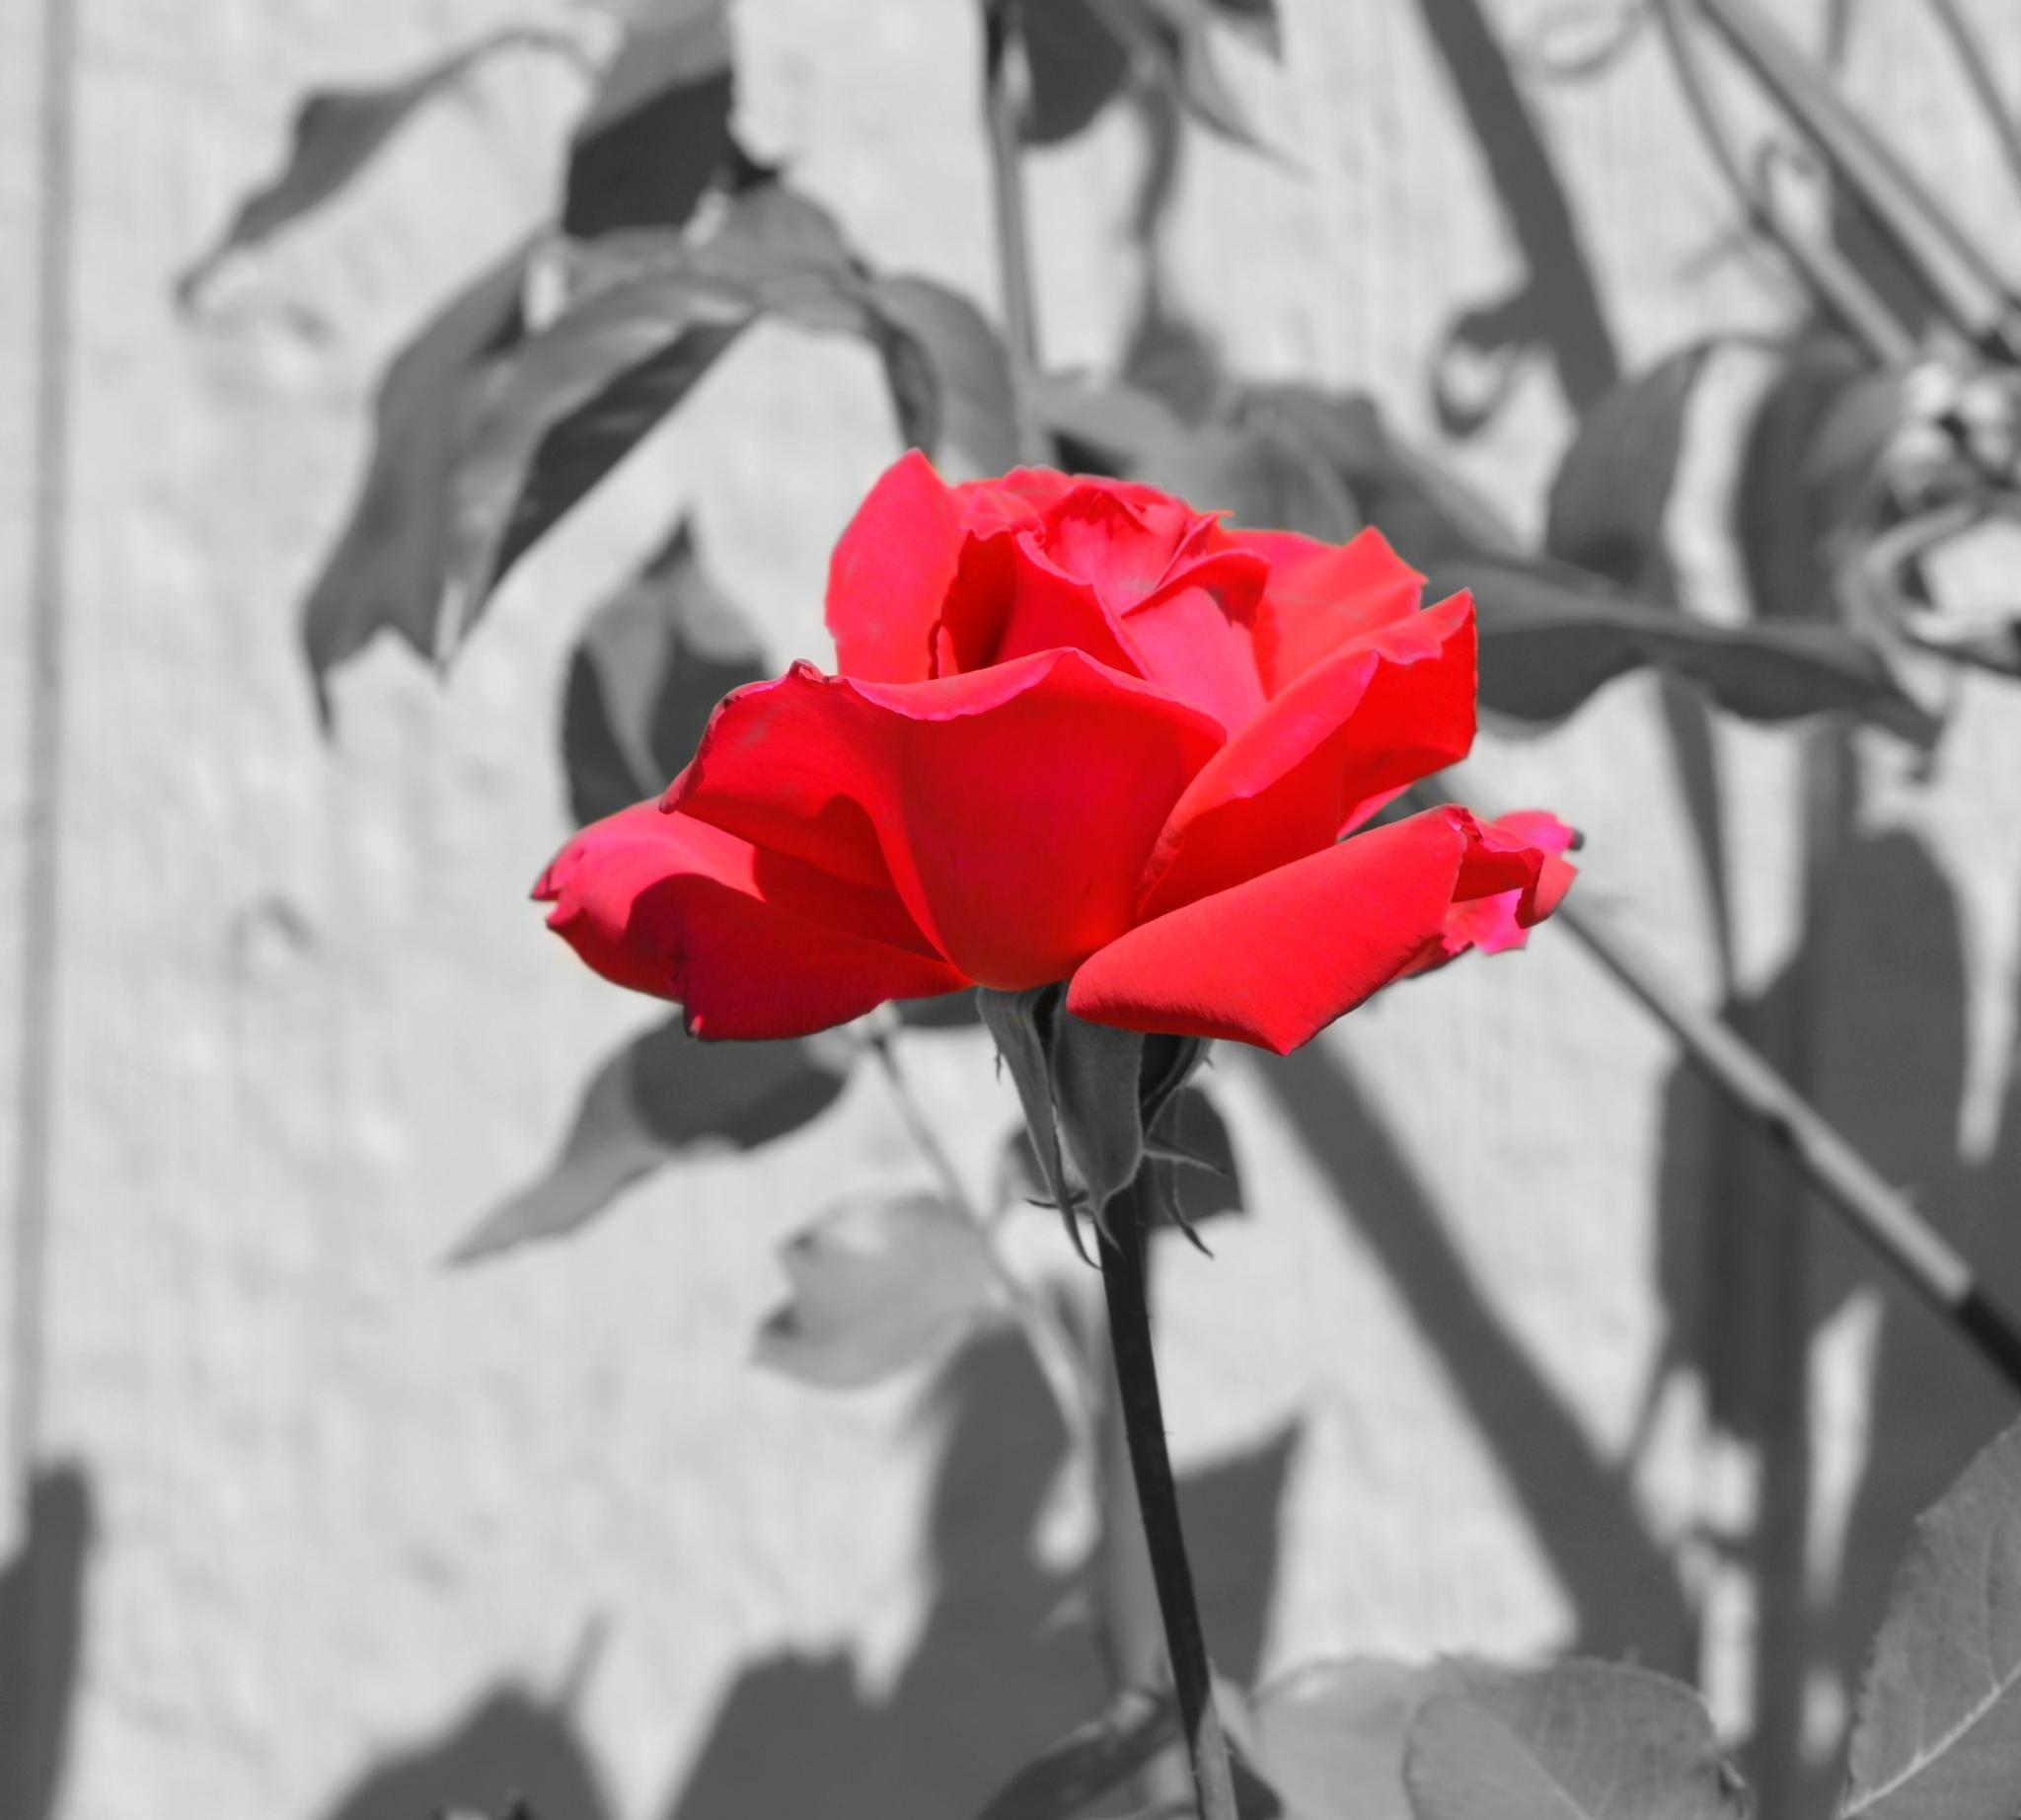 Rose by Michelle Farmer